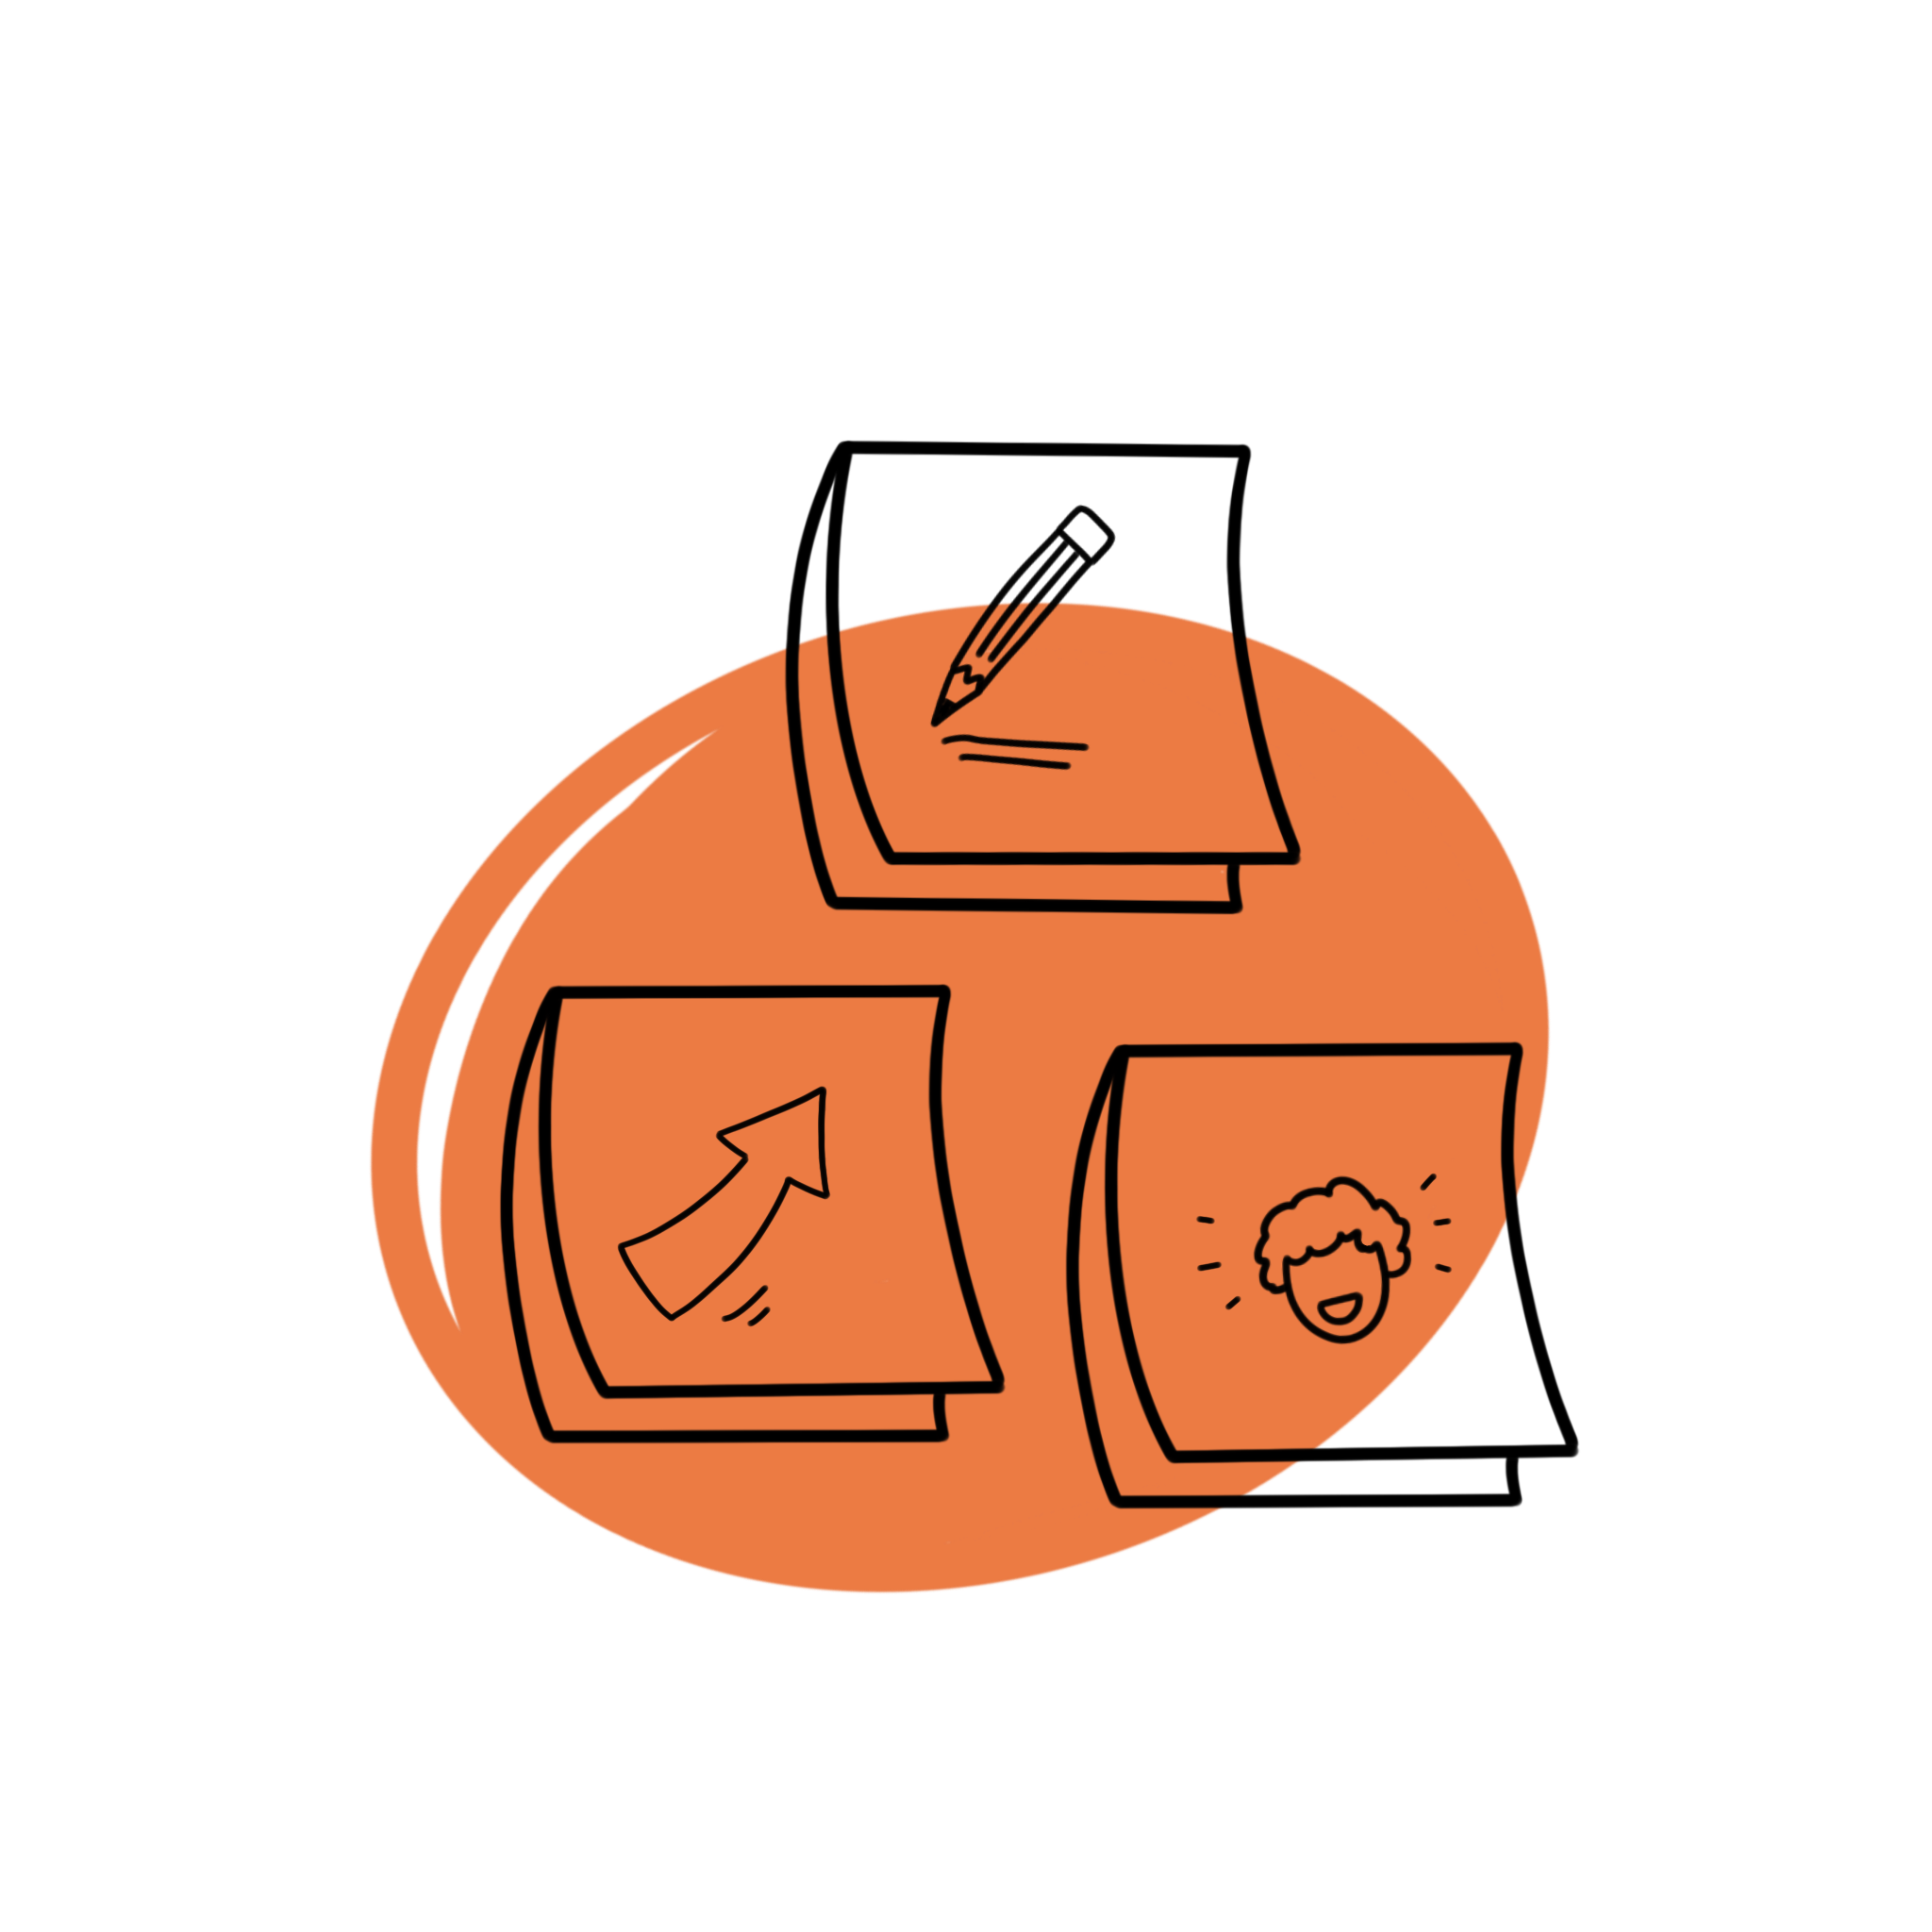 Sketchnote-Angebot Prozess